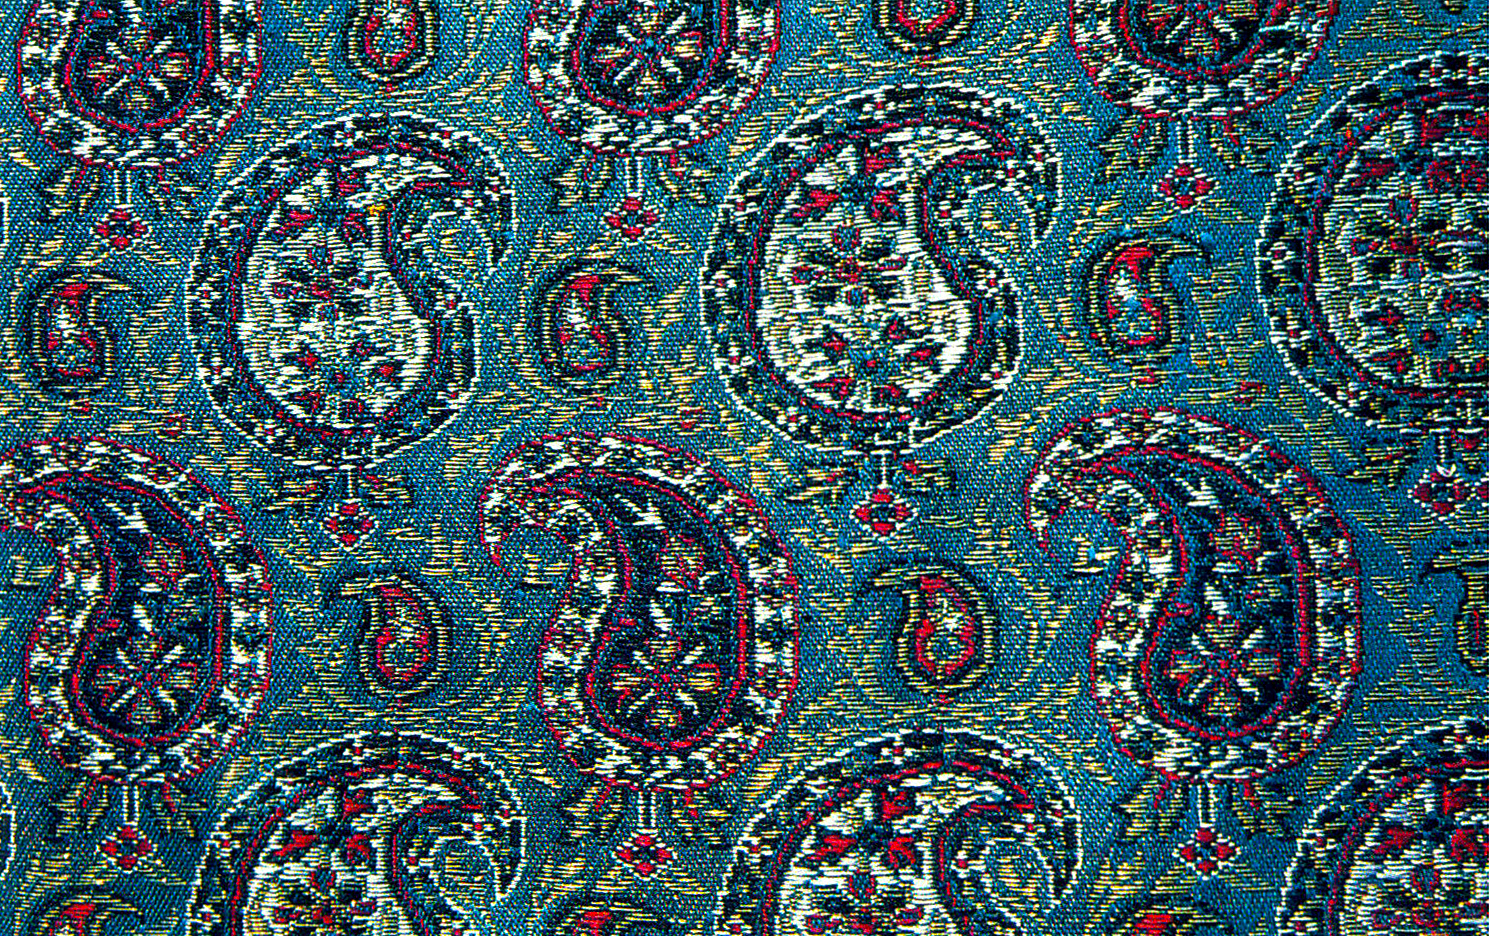 Filepersian Silk Brocade Paisley Persian Paisley